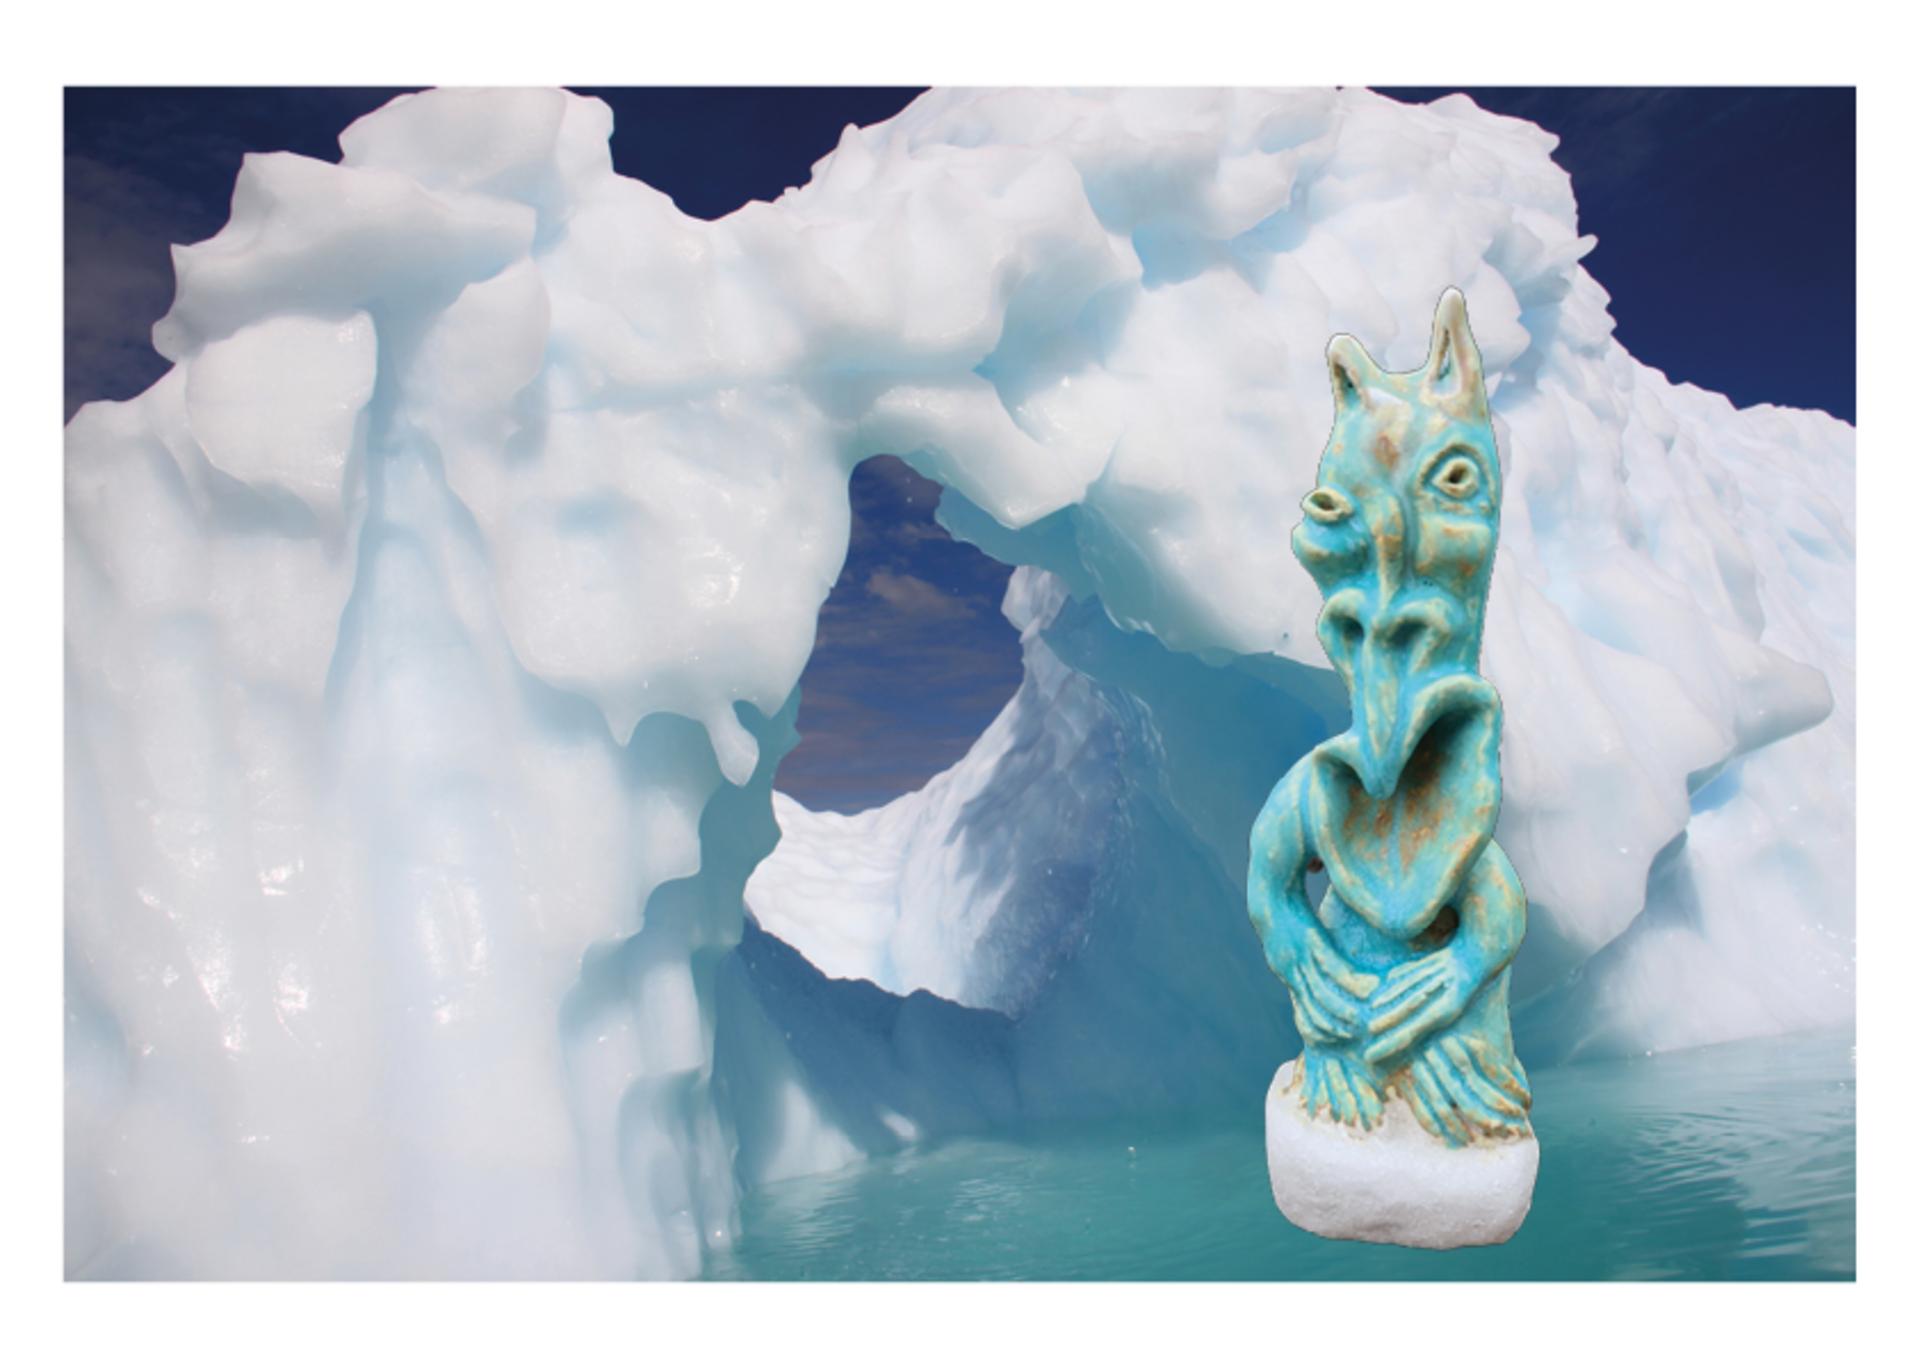 Iceberg mystery